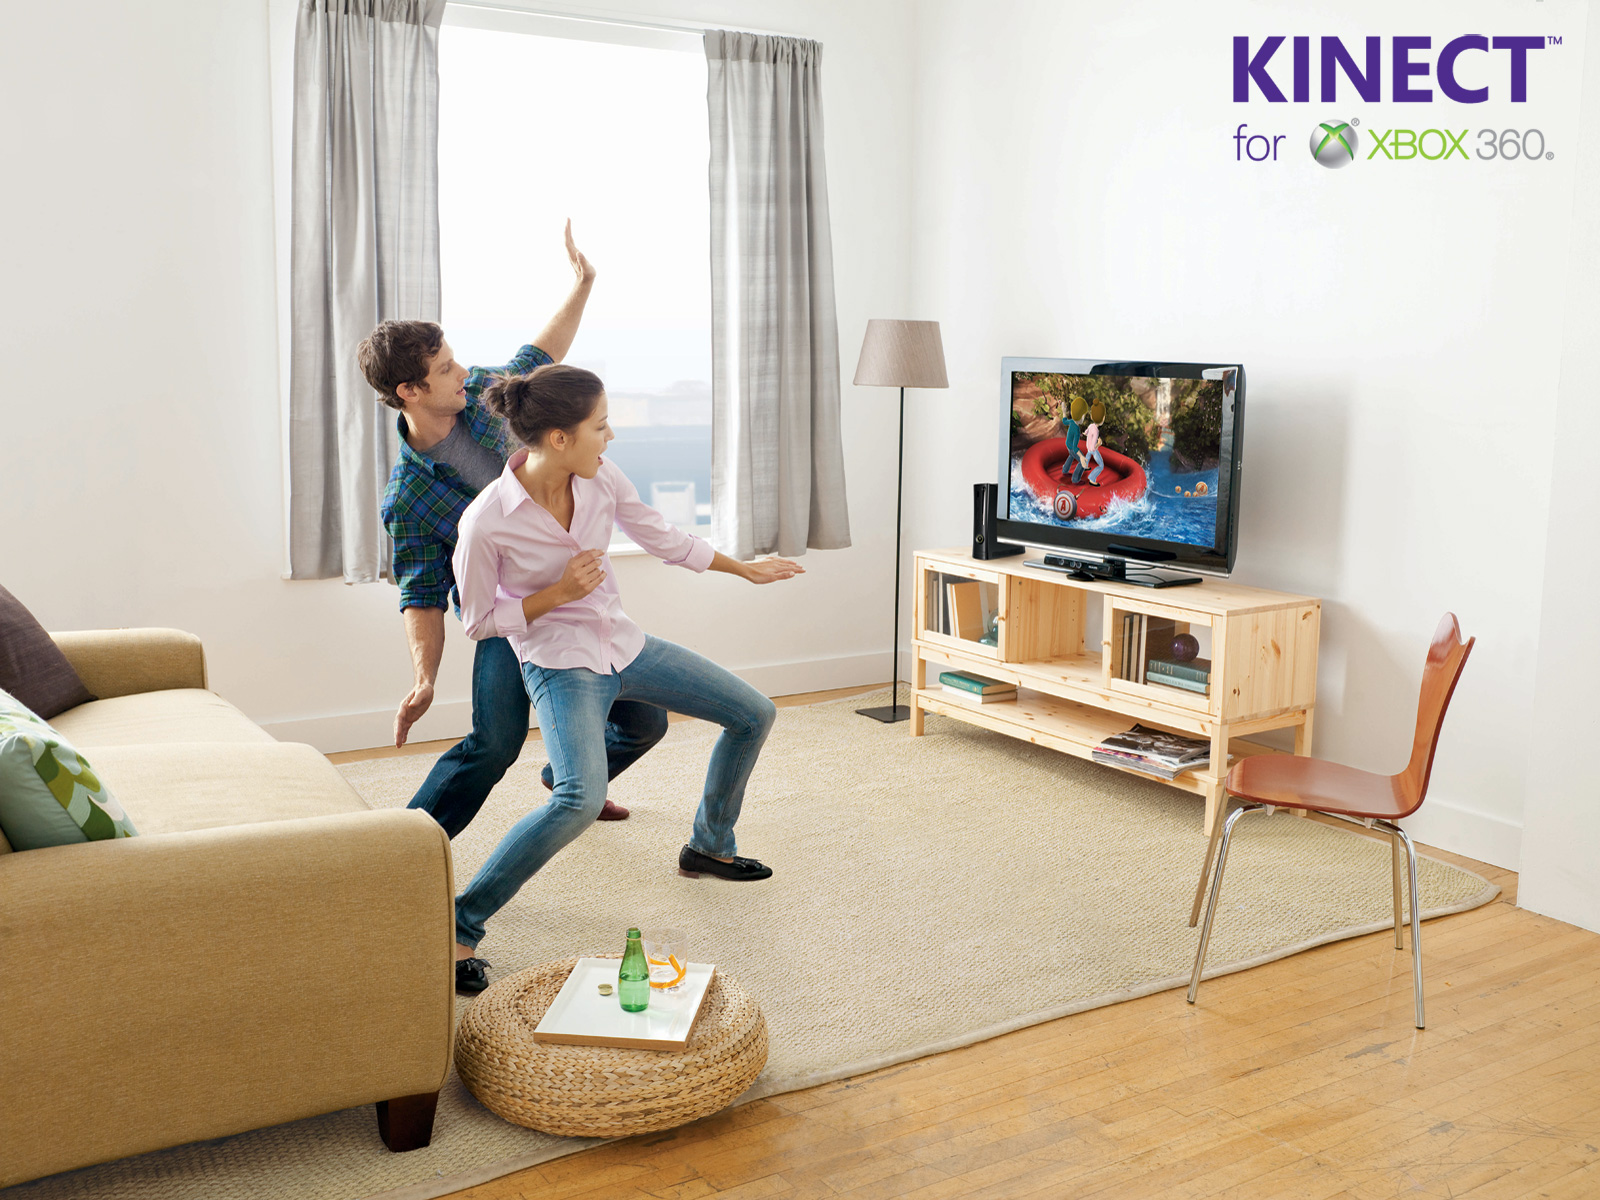 h and b digital photography blog review kinect sensor. Black Bedroom Furniture Sets. Home Design Ideas